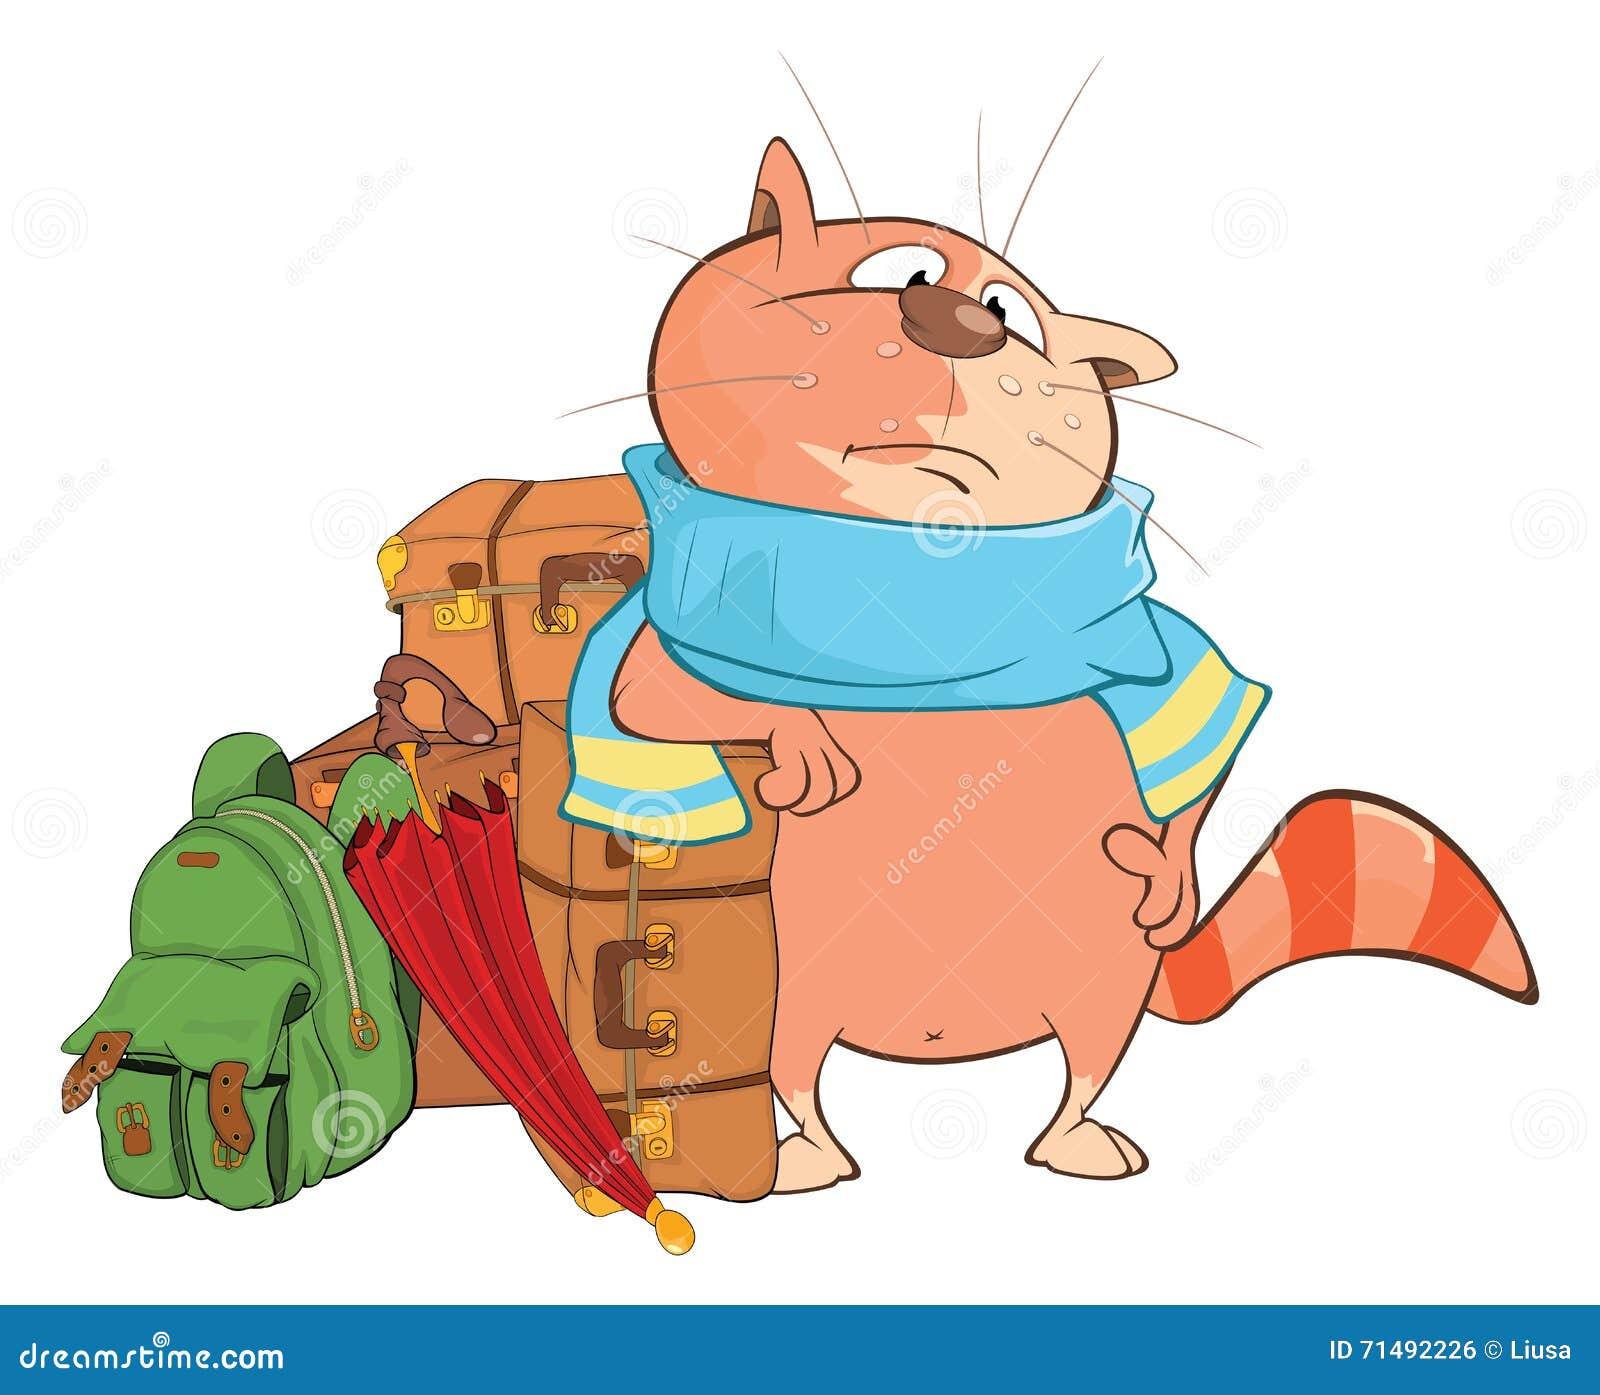 Dessin de chat mignon manga dessin de manga - Voyageur dessin ...